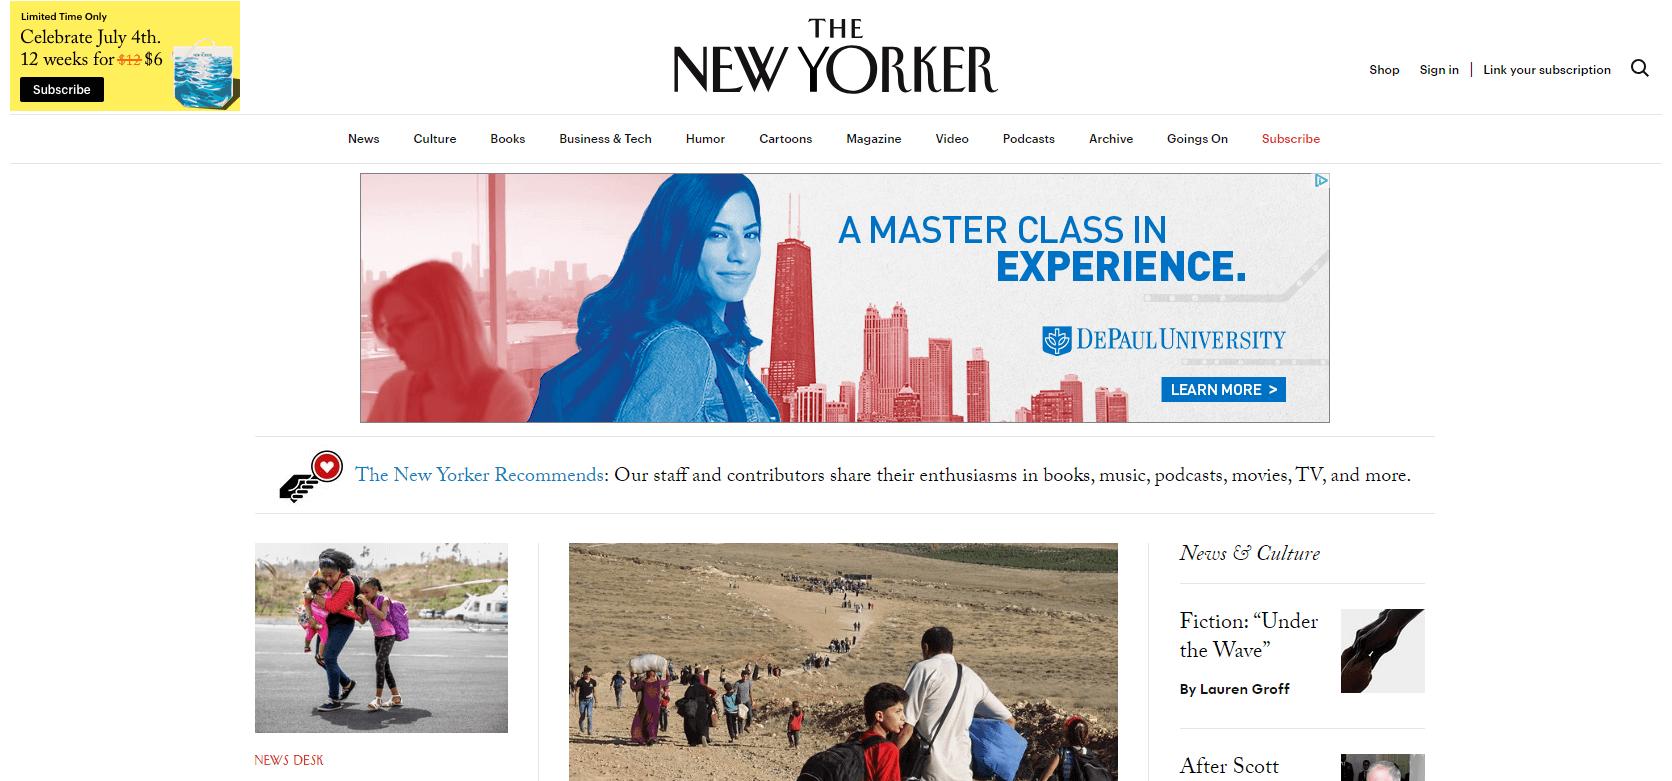 The New Yorker website.